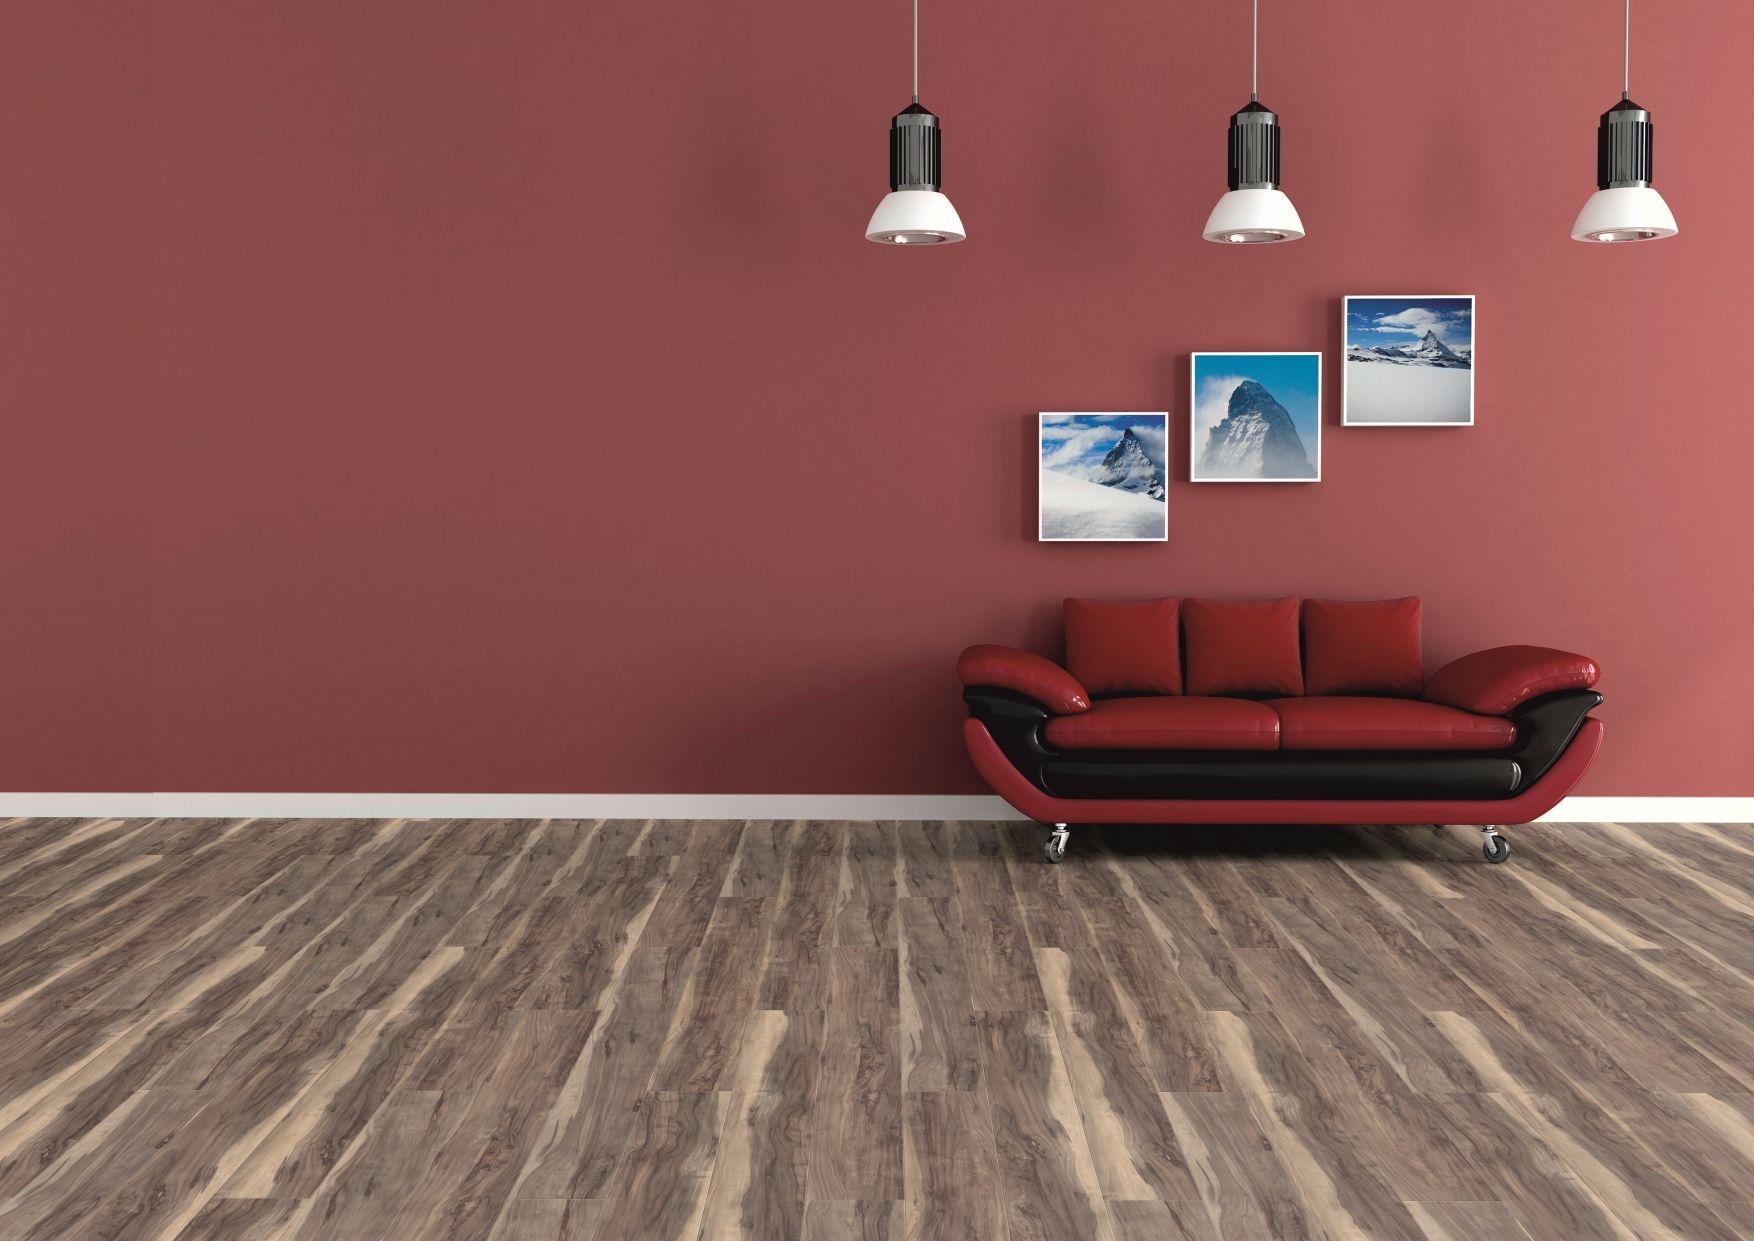 Elegant Evoke Luna Laminate Floor   Available At Ed Selden Carpet One In Lakewood,  Wa